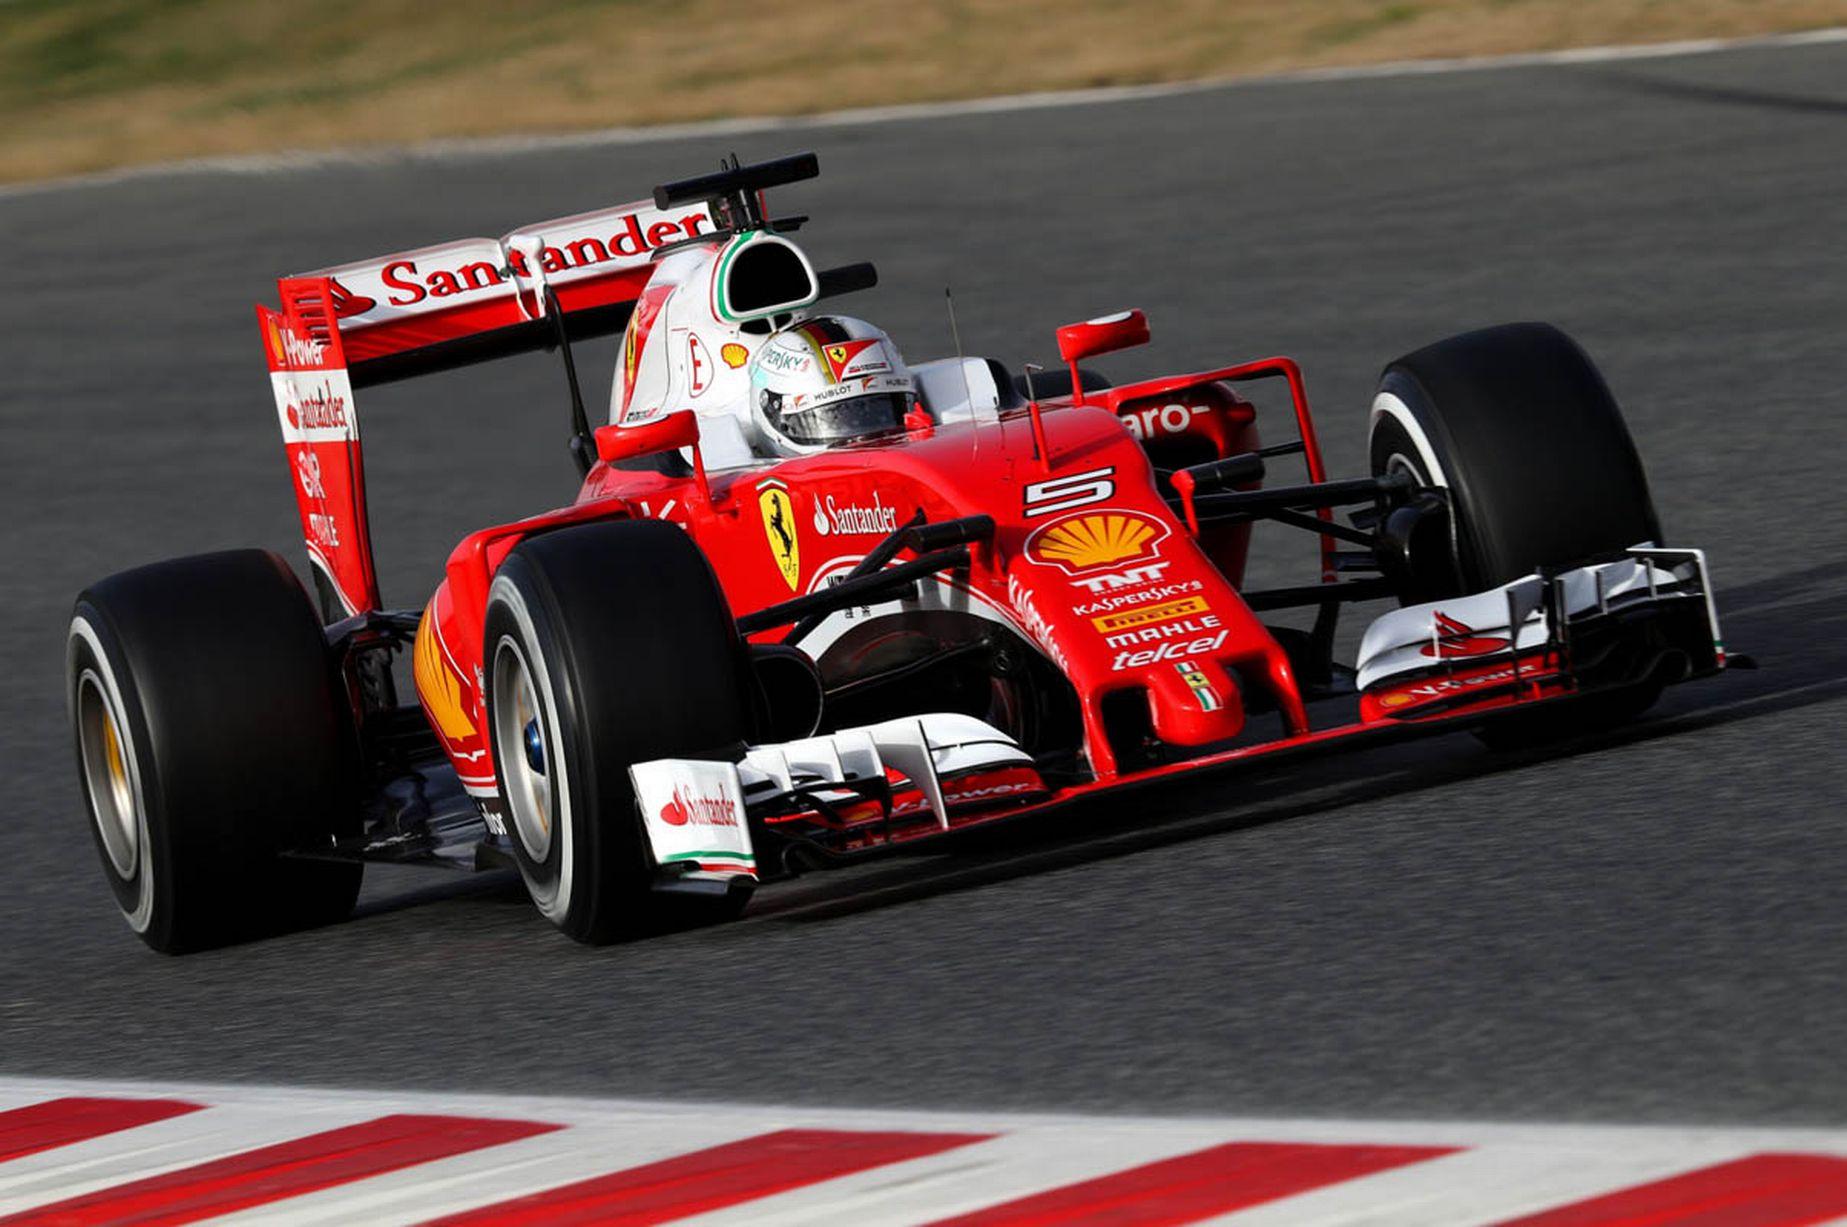 Vettel-Montmeló-2016